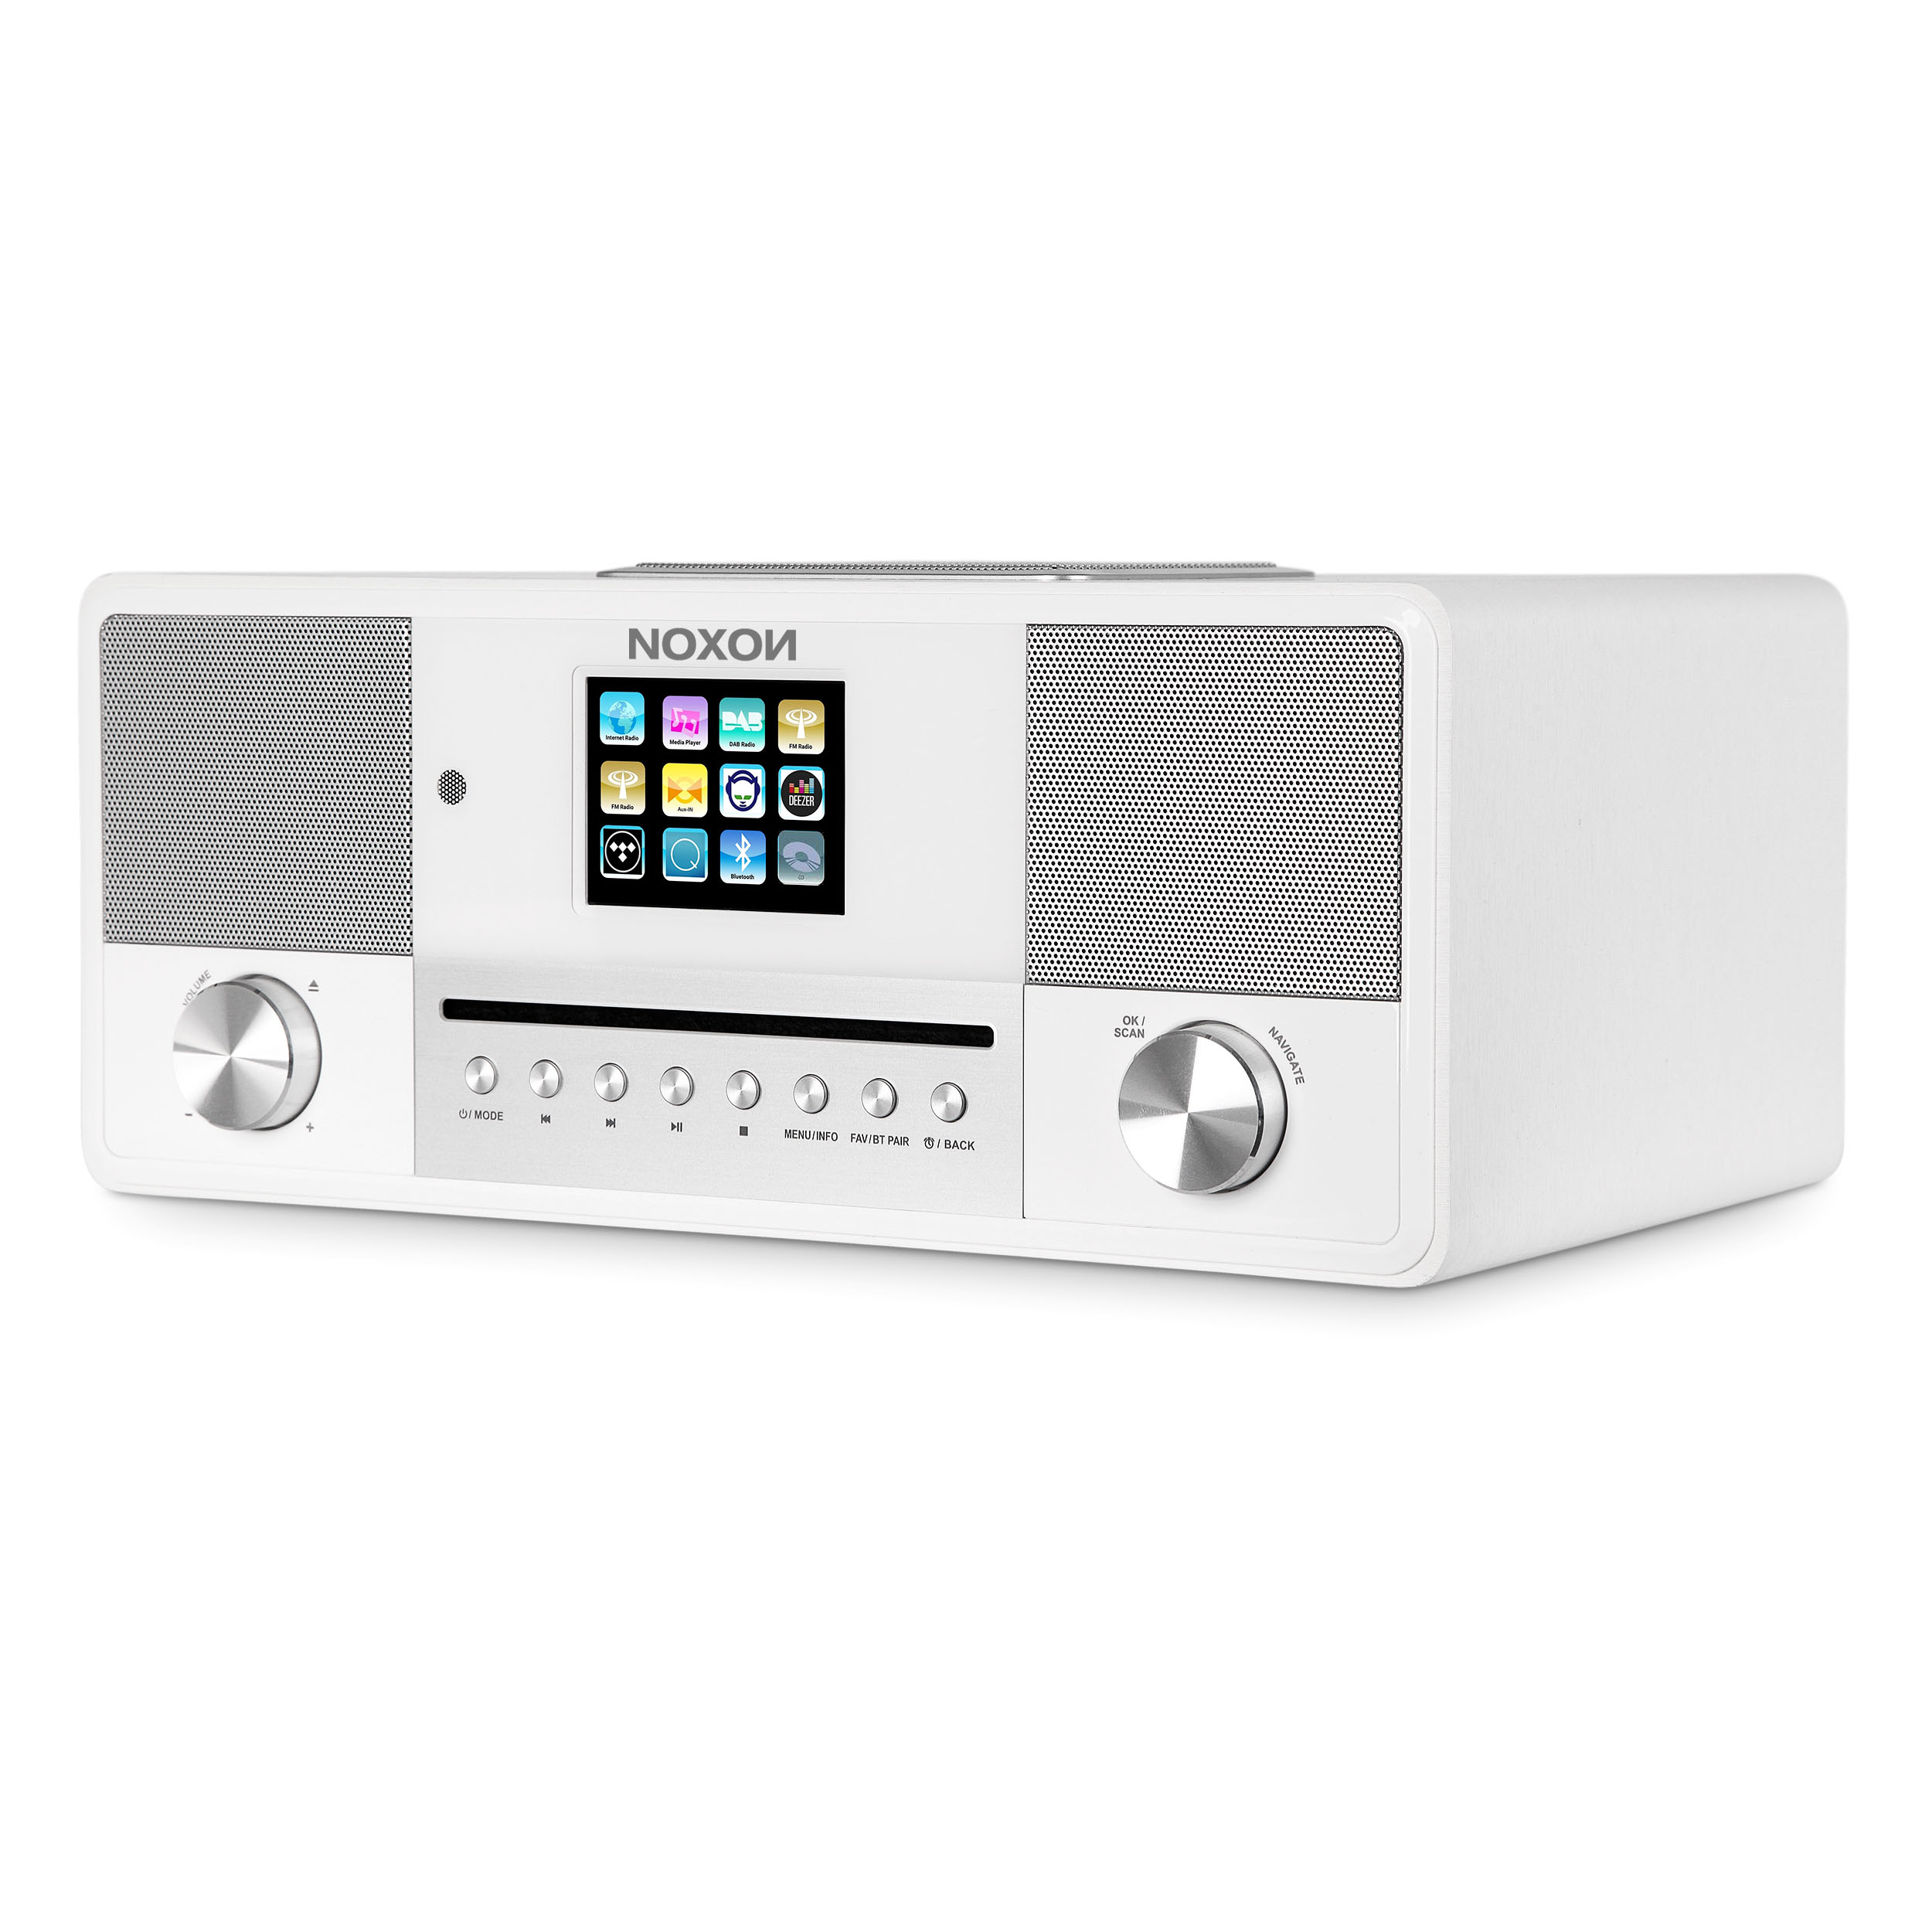 Noxon Jura - DAB+ UKW Internetradio mit Bluetooth, CD Player, Steuerung per App